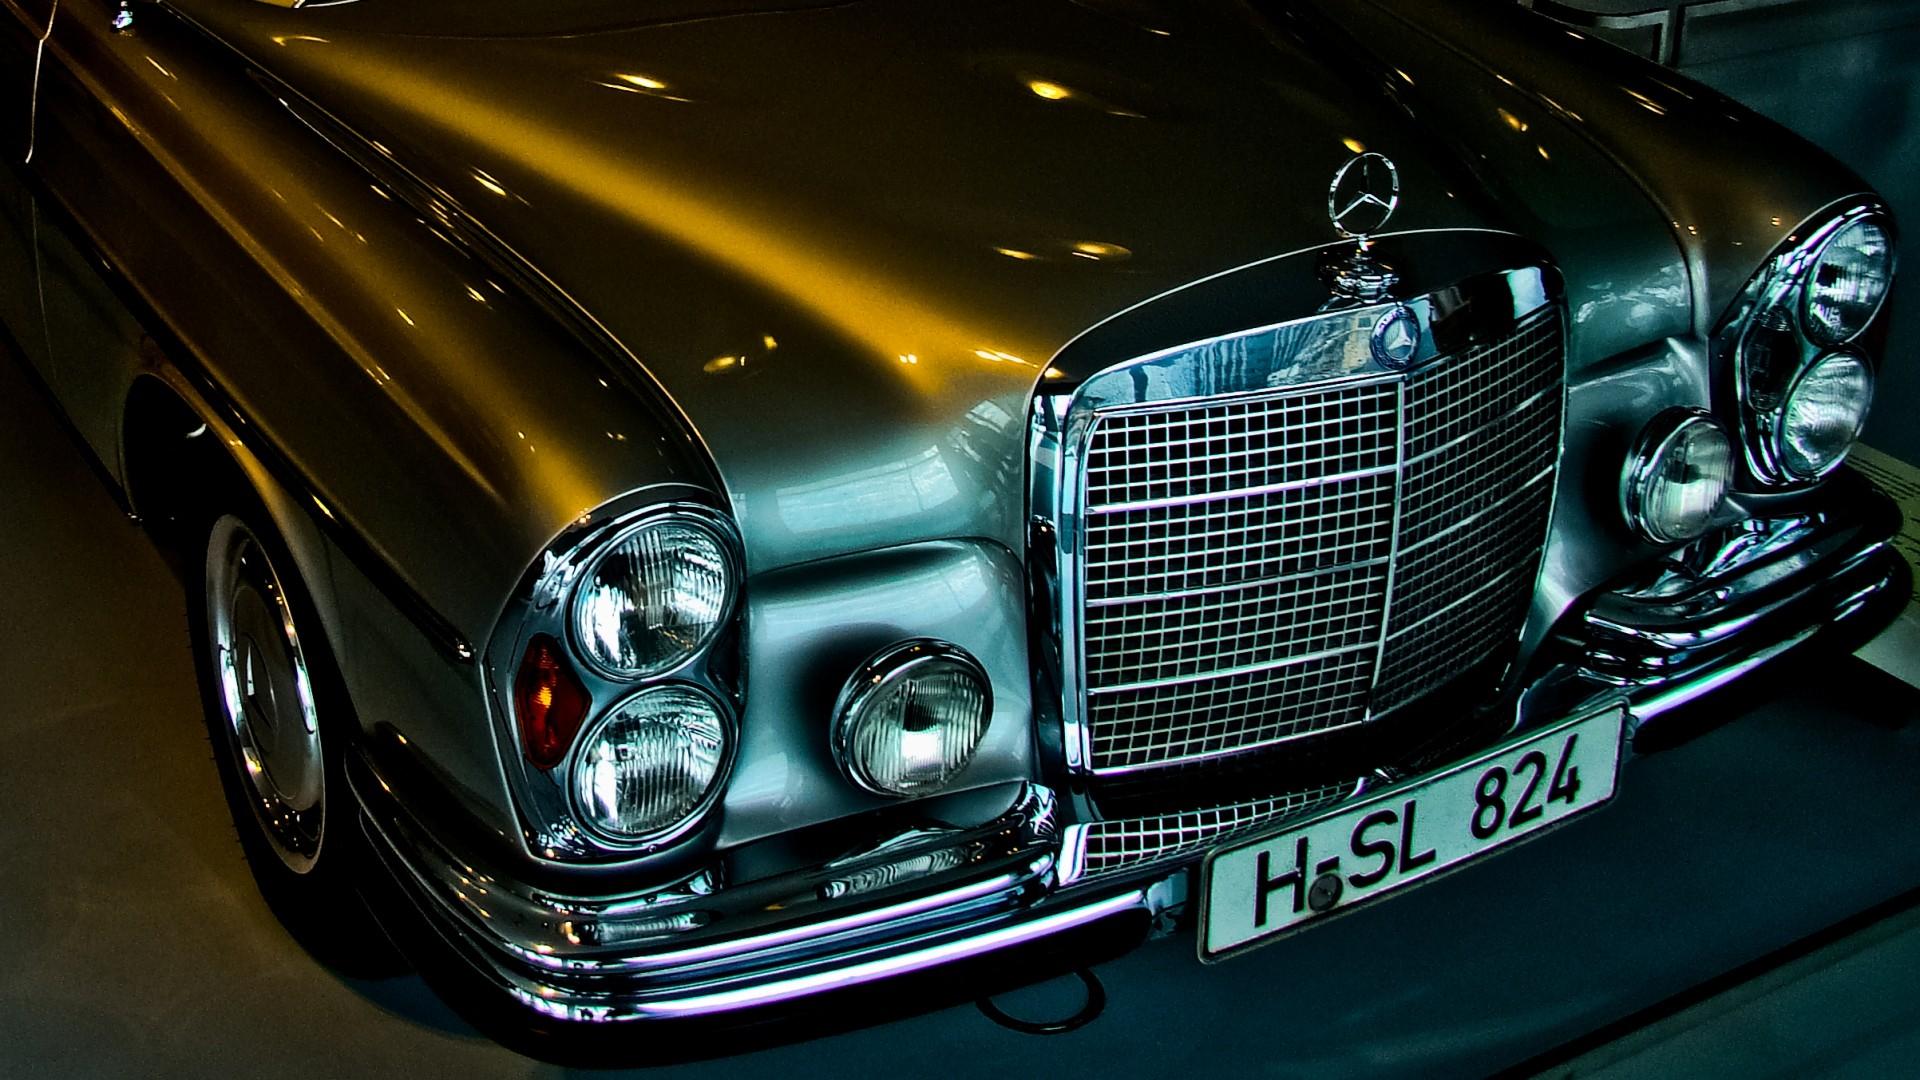 Mercedes Benz Wallpapers 1920 1080p Wallpapersafari